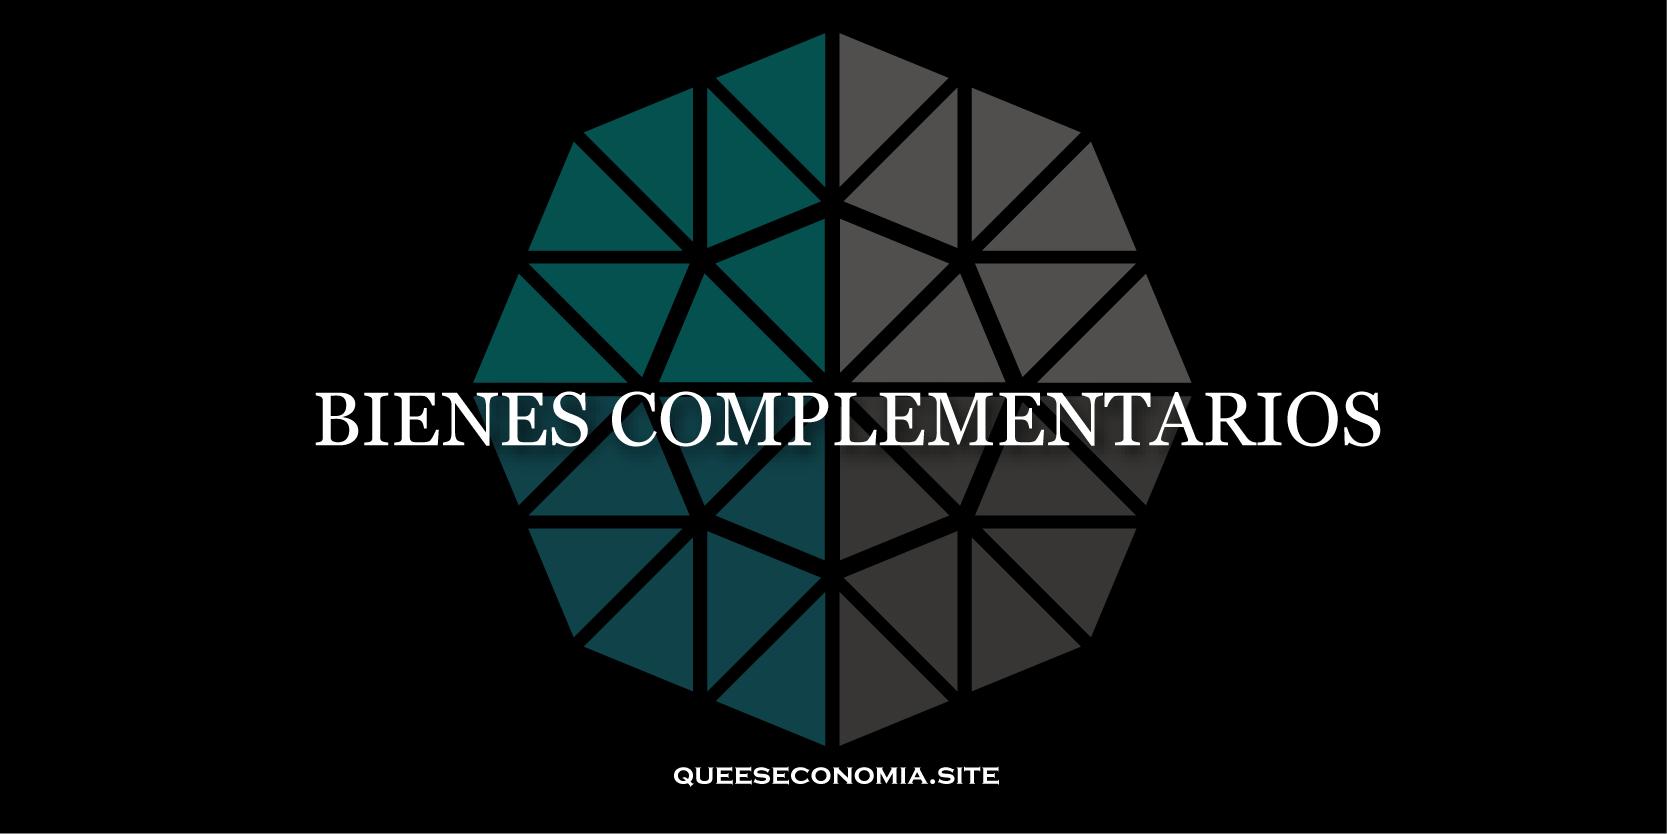 bienes complementarios